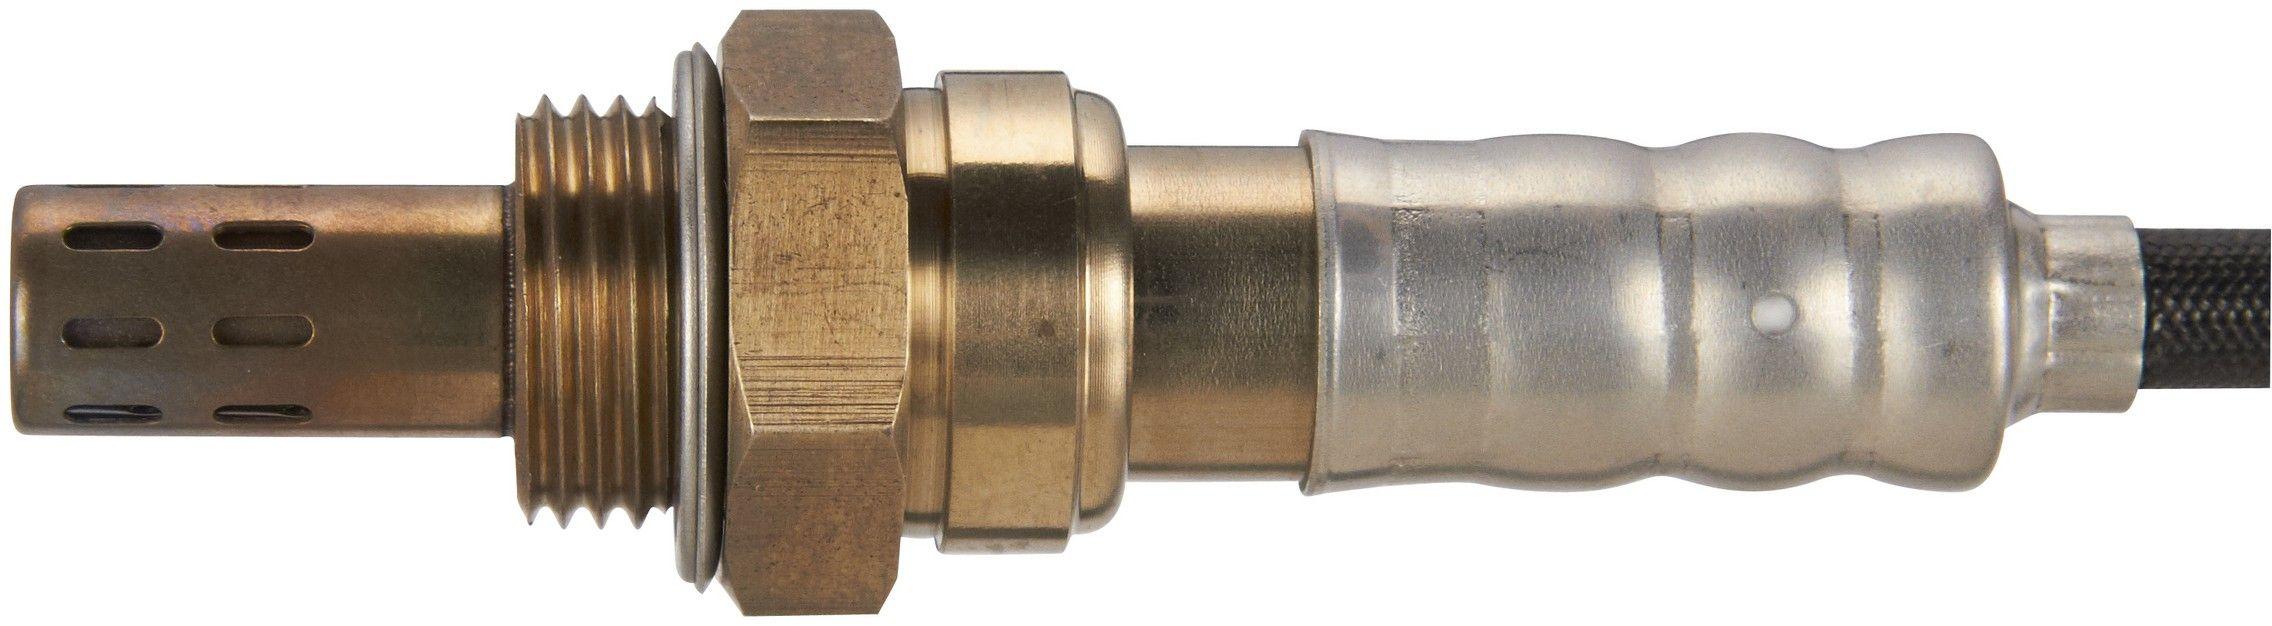 Nissan Altima Oxygen Sensor Replacement Bosch Delphi Denso 97 Engine Diagram 1997 Upstream 4 Cyl 24l Spectra Os5146